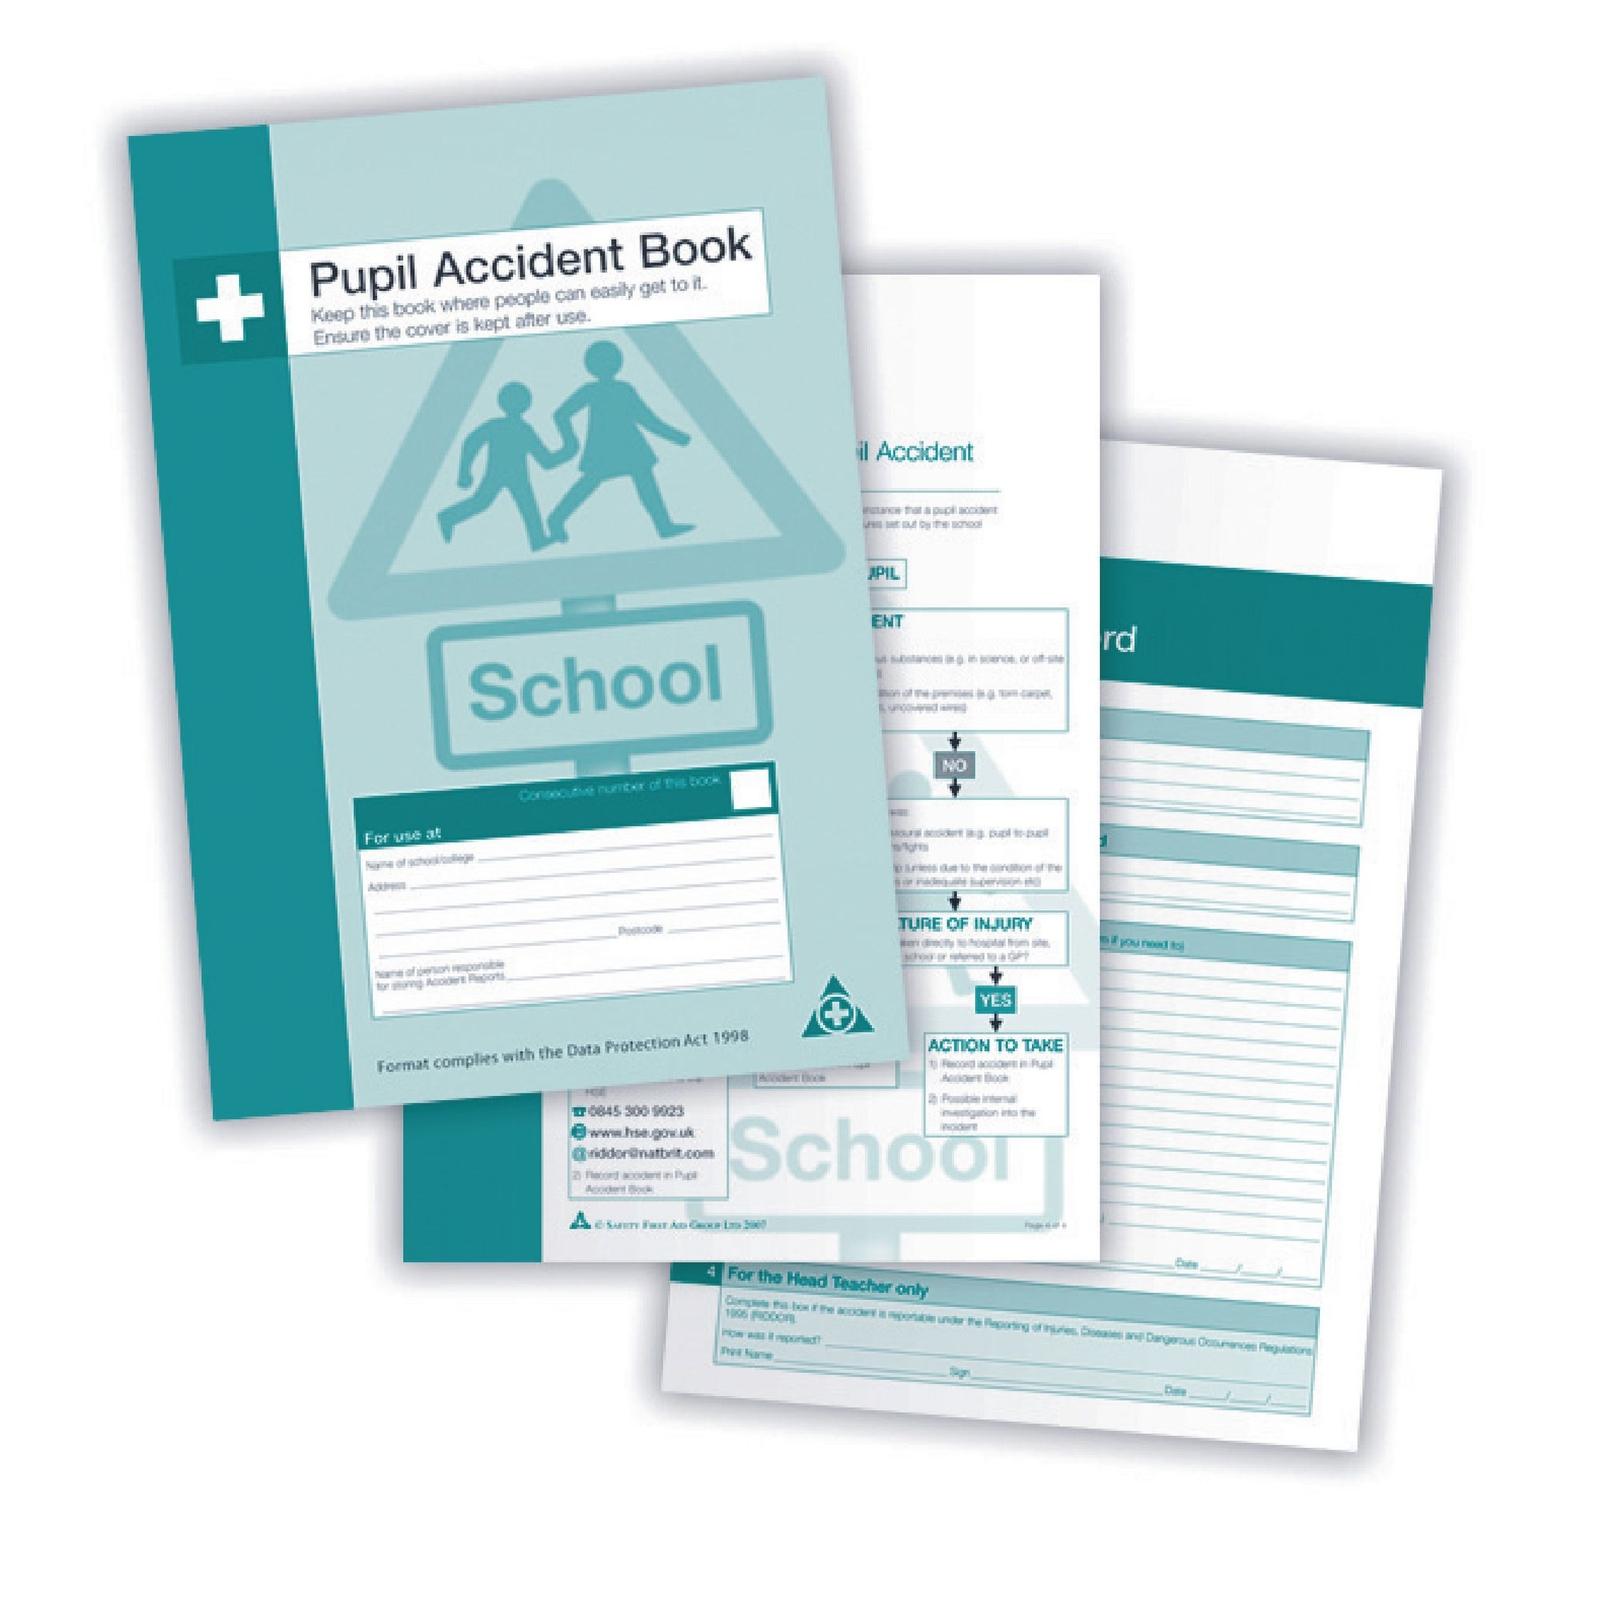 A4 Pupil Accident Book - Pupil